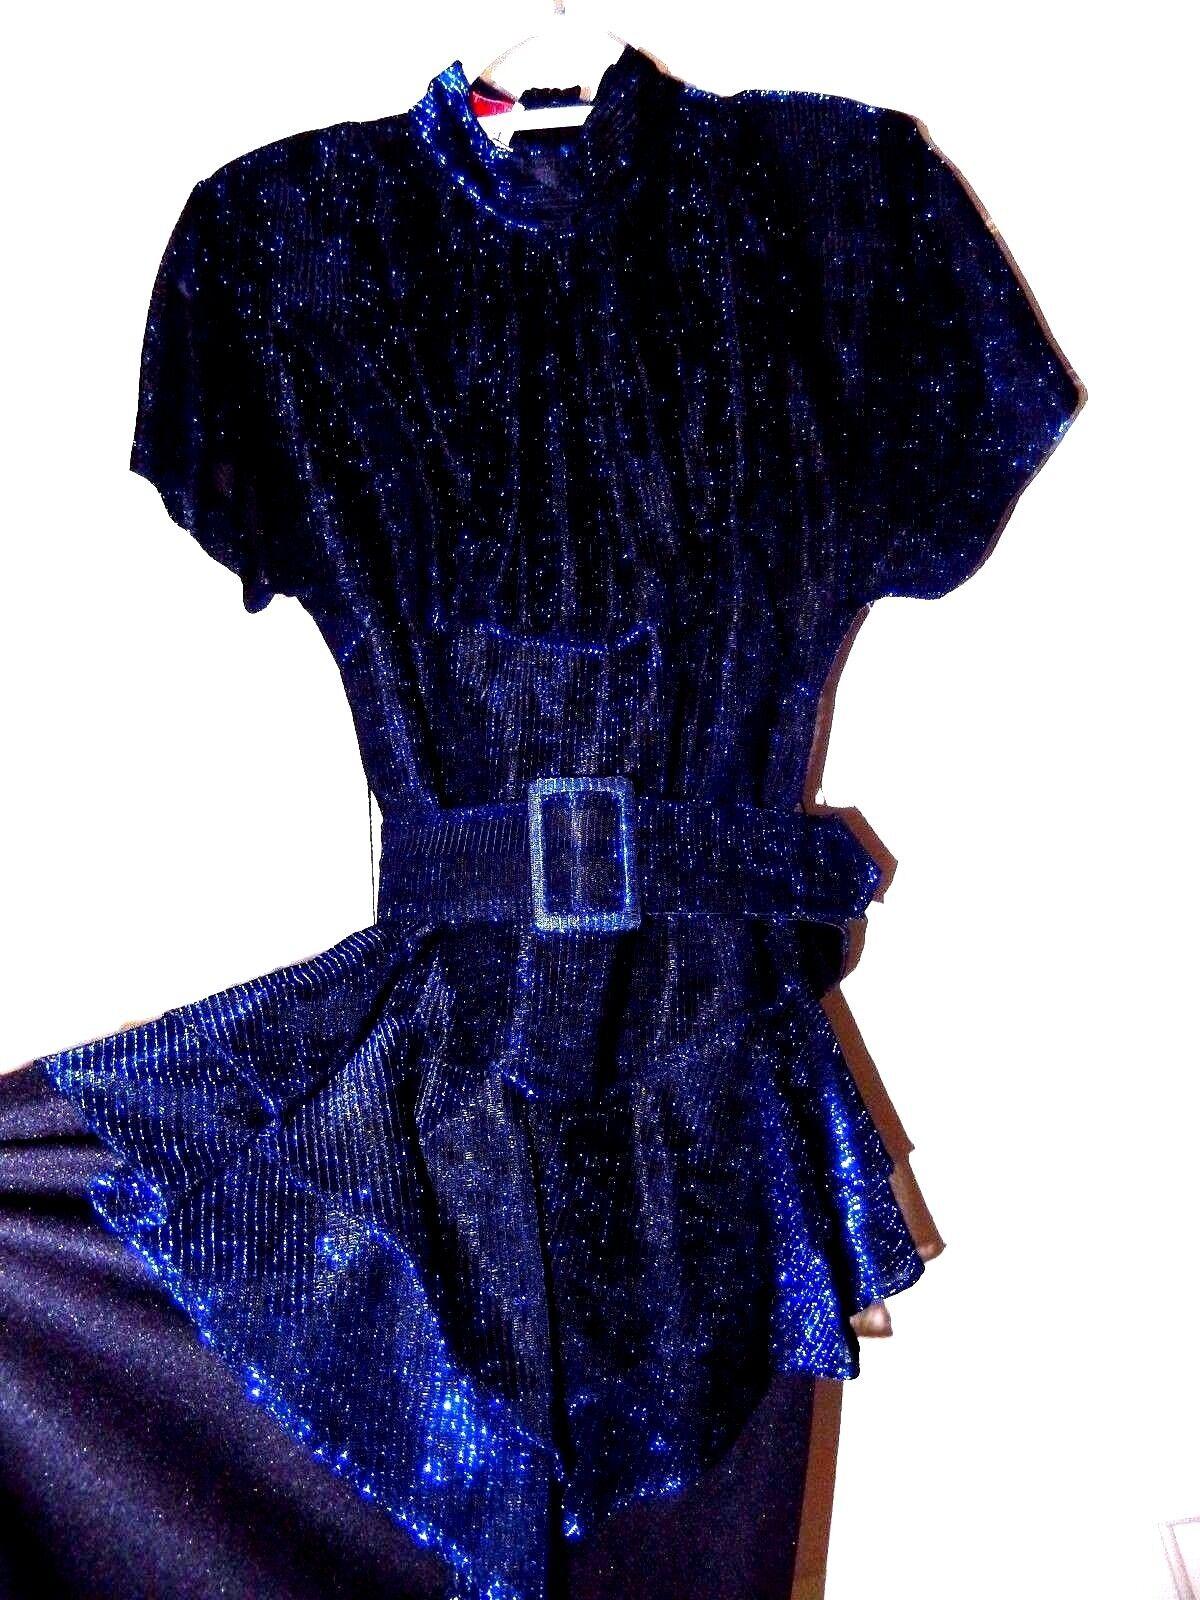 Vintage Diamond's Run Dress-5 6  WOW Styling & Sheer Midnight bluee Twinkle